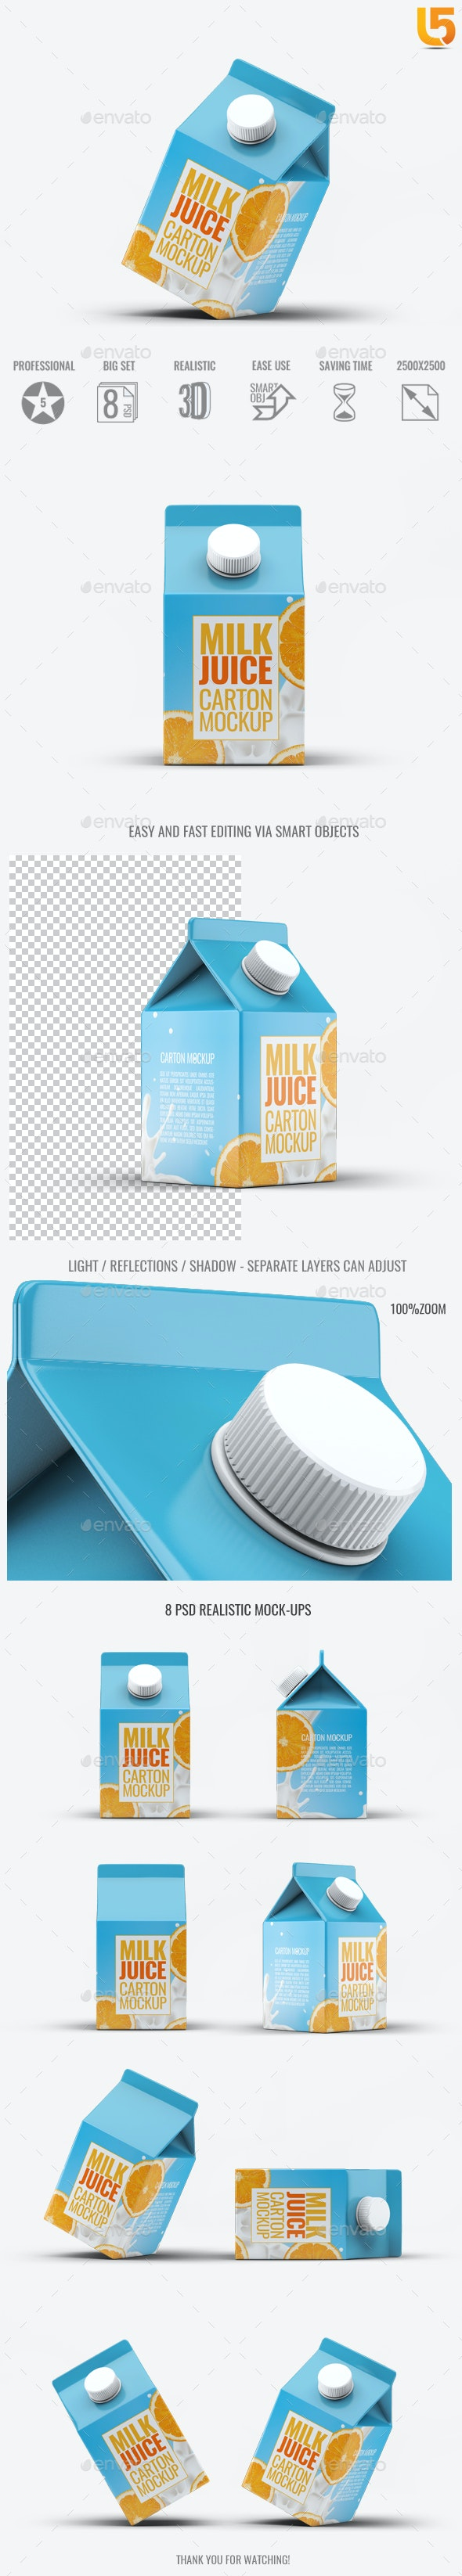 Milk or Juice Carton Mock-Up v.4 - Food and Drink Packaging